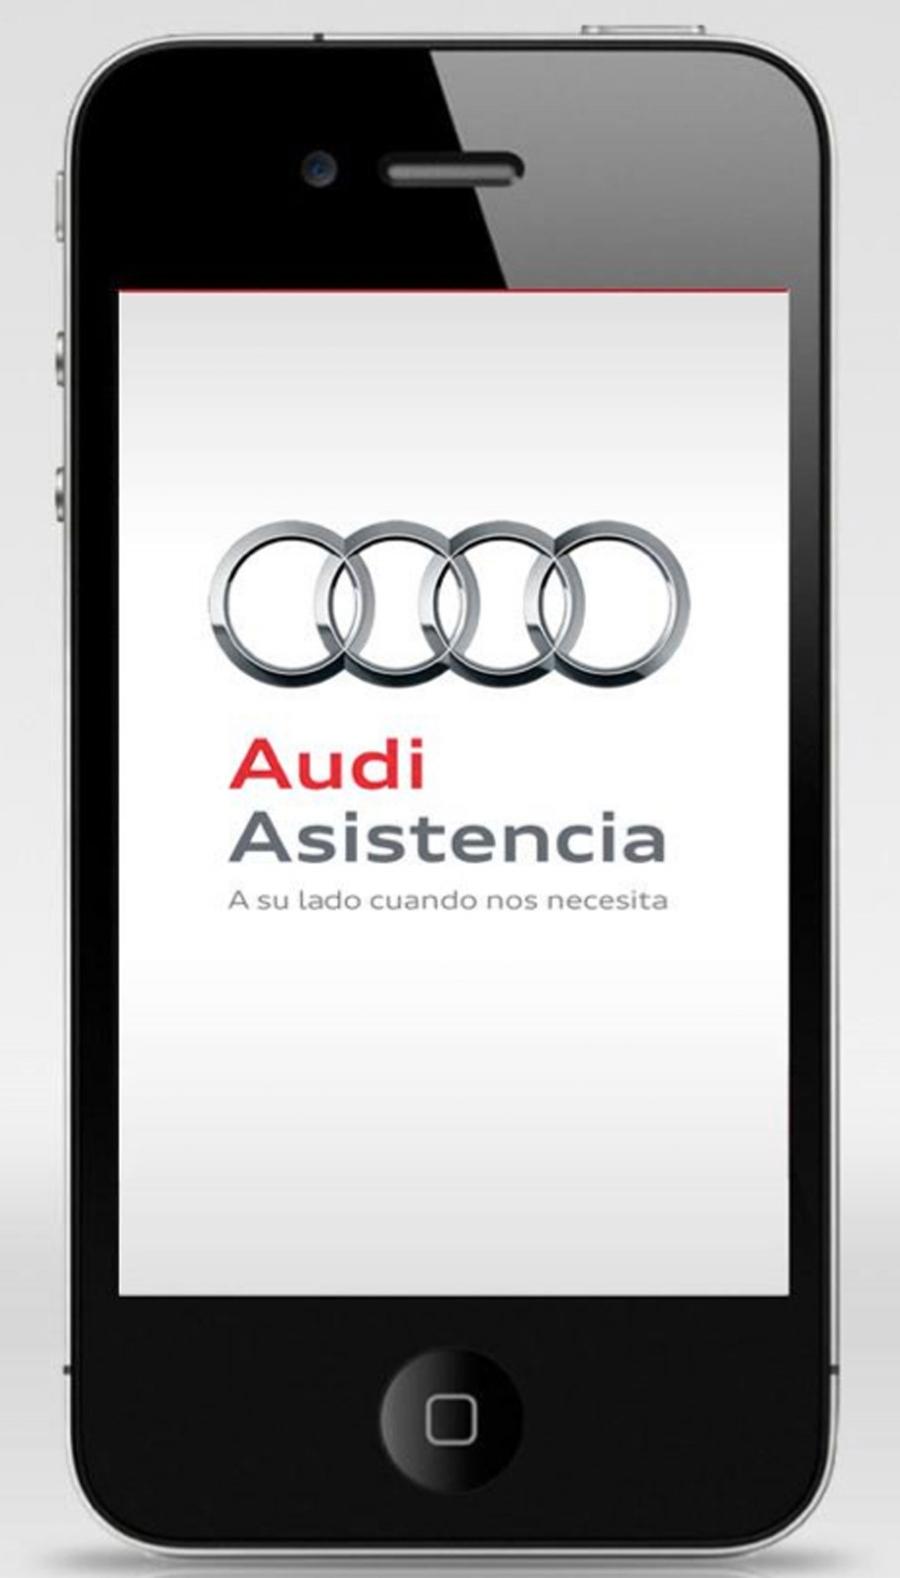 Audi λανσάρει μια εφαρμογή smartphone που παρέχει τεχνική βοήθεια